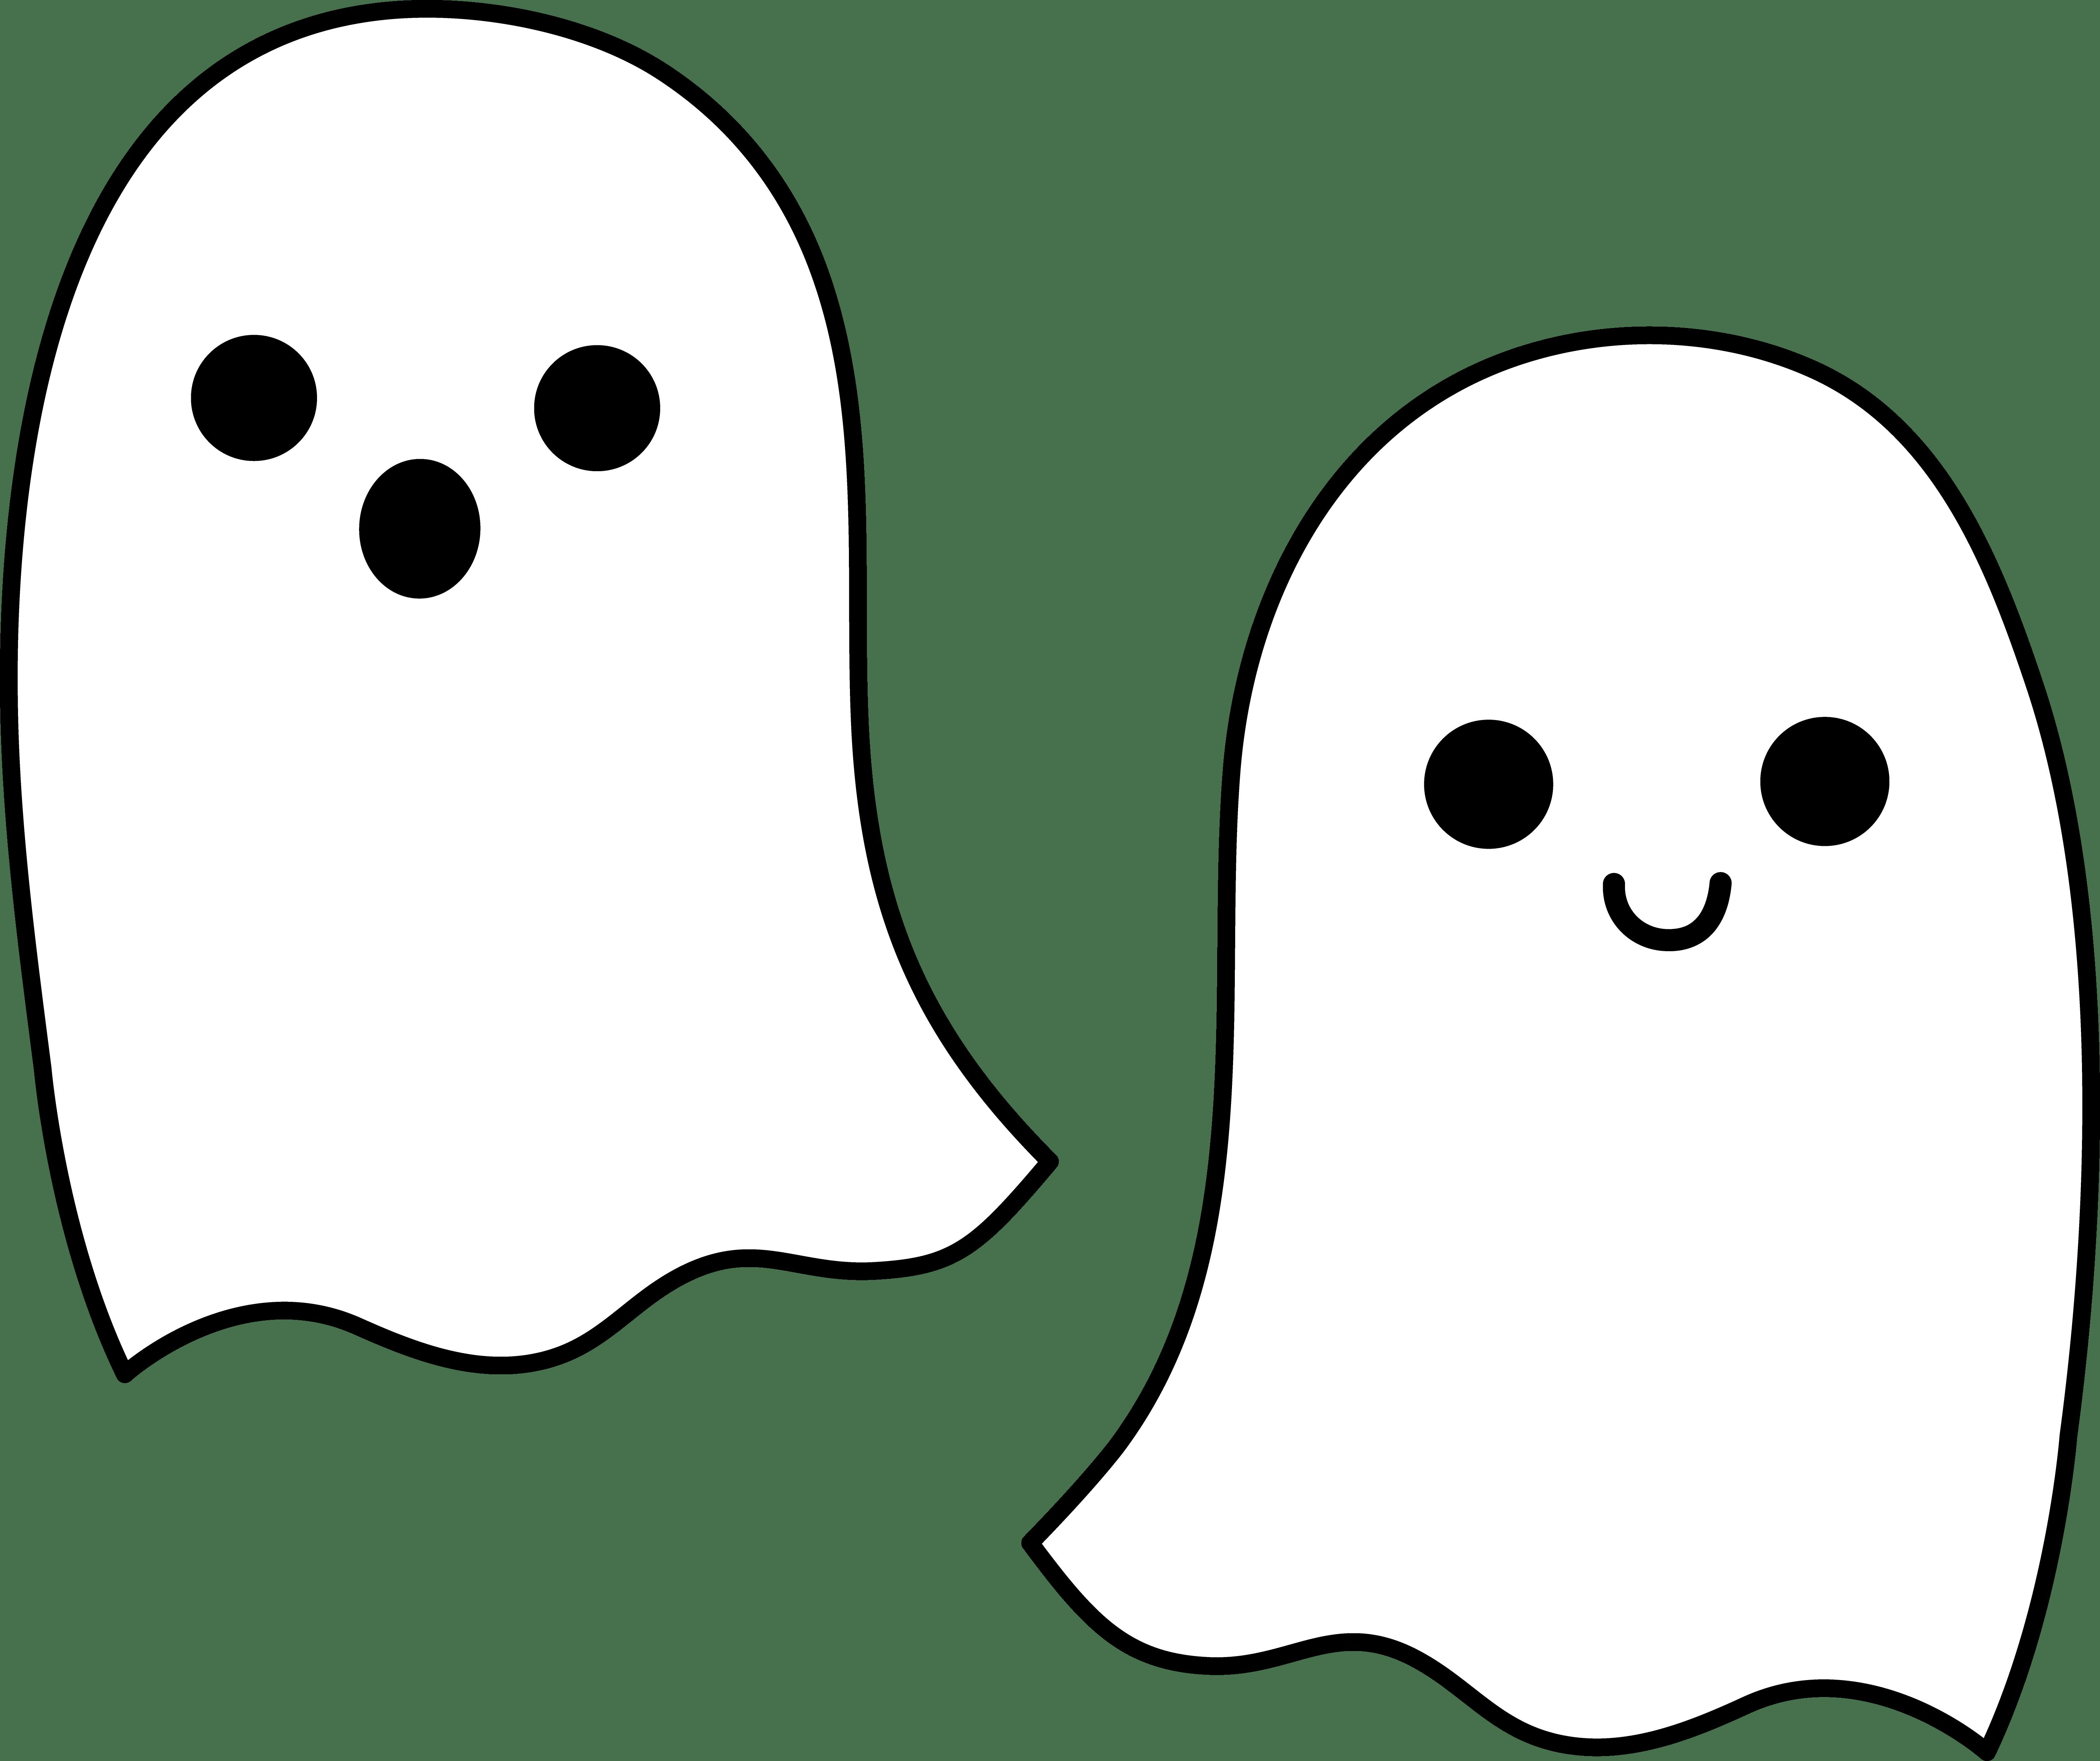 Free Halloween Ghost Pics, Download Free Clip Art, Free ... (5942 x 4982 Pixel)